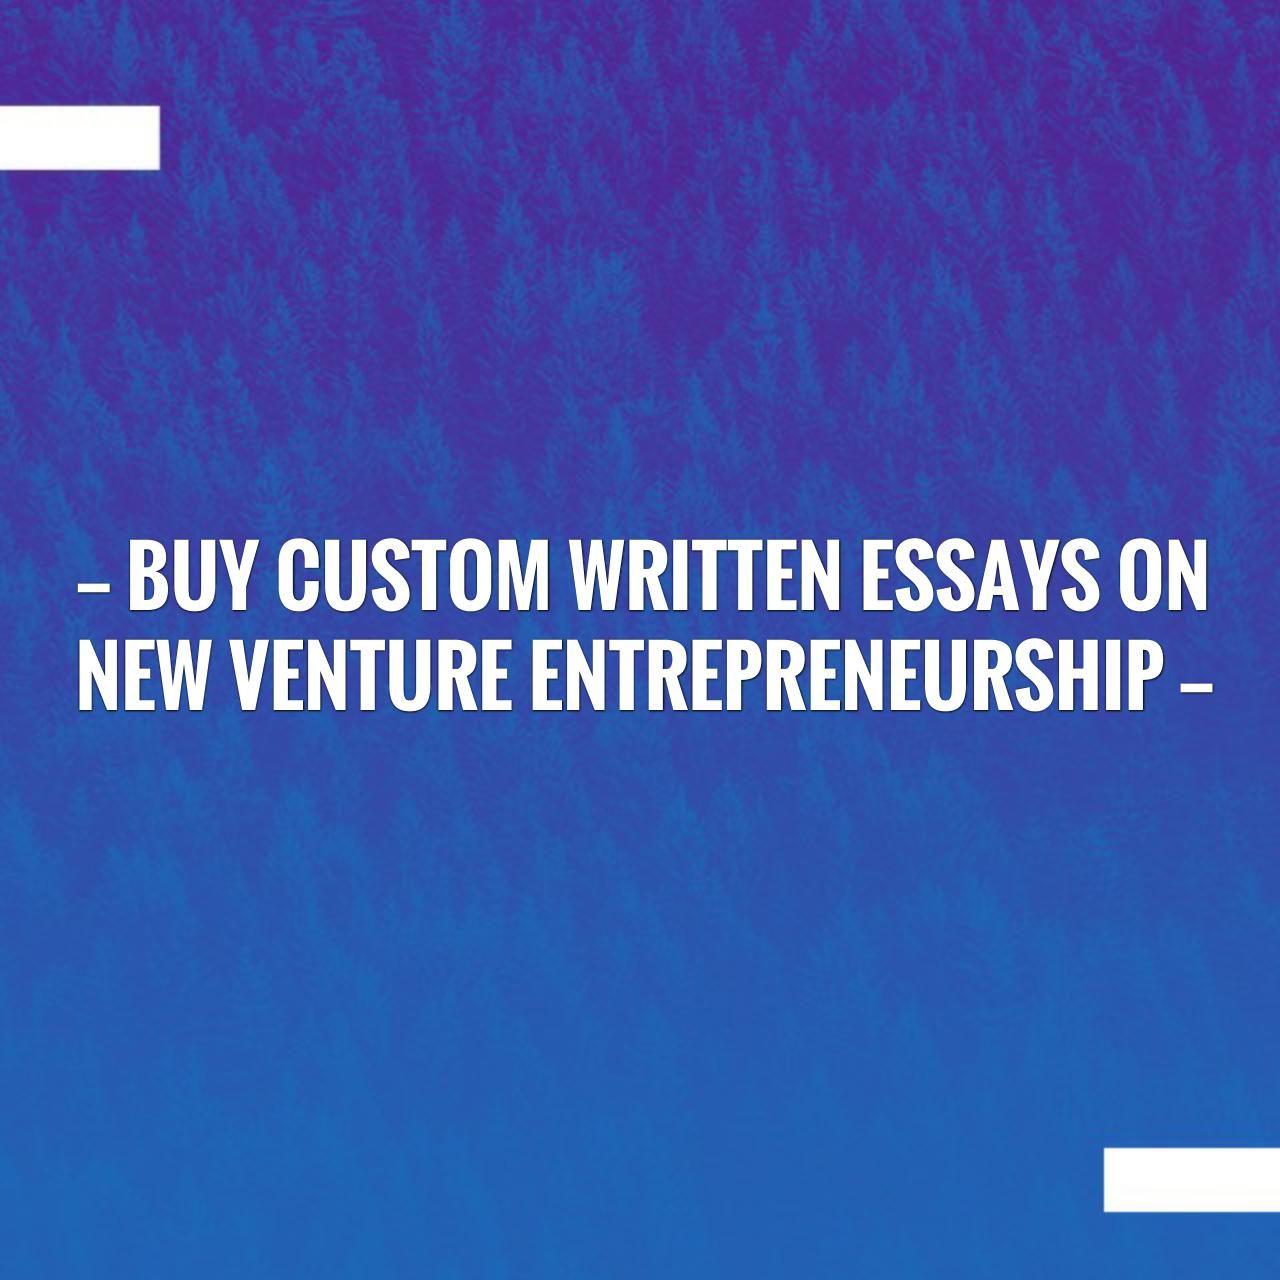 Purchase custom writing